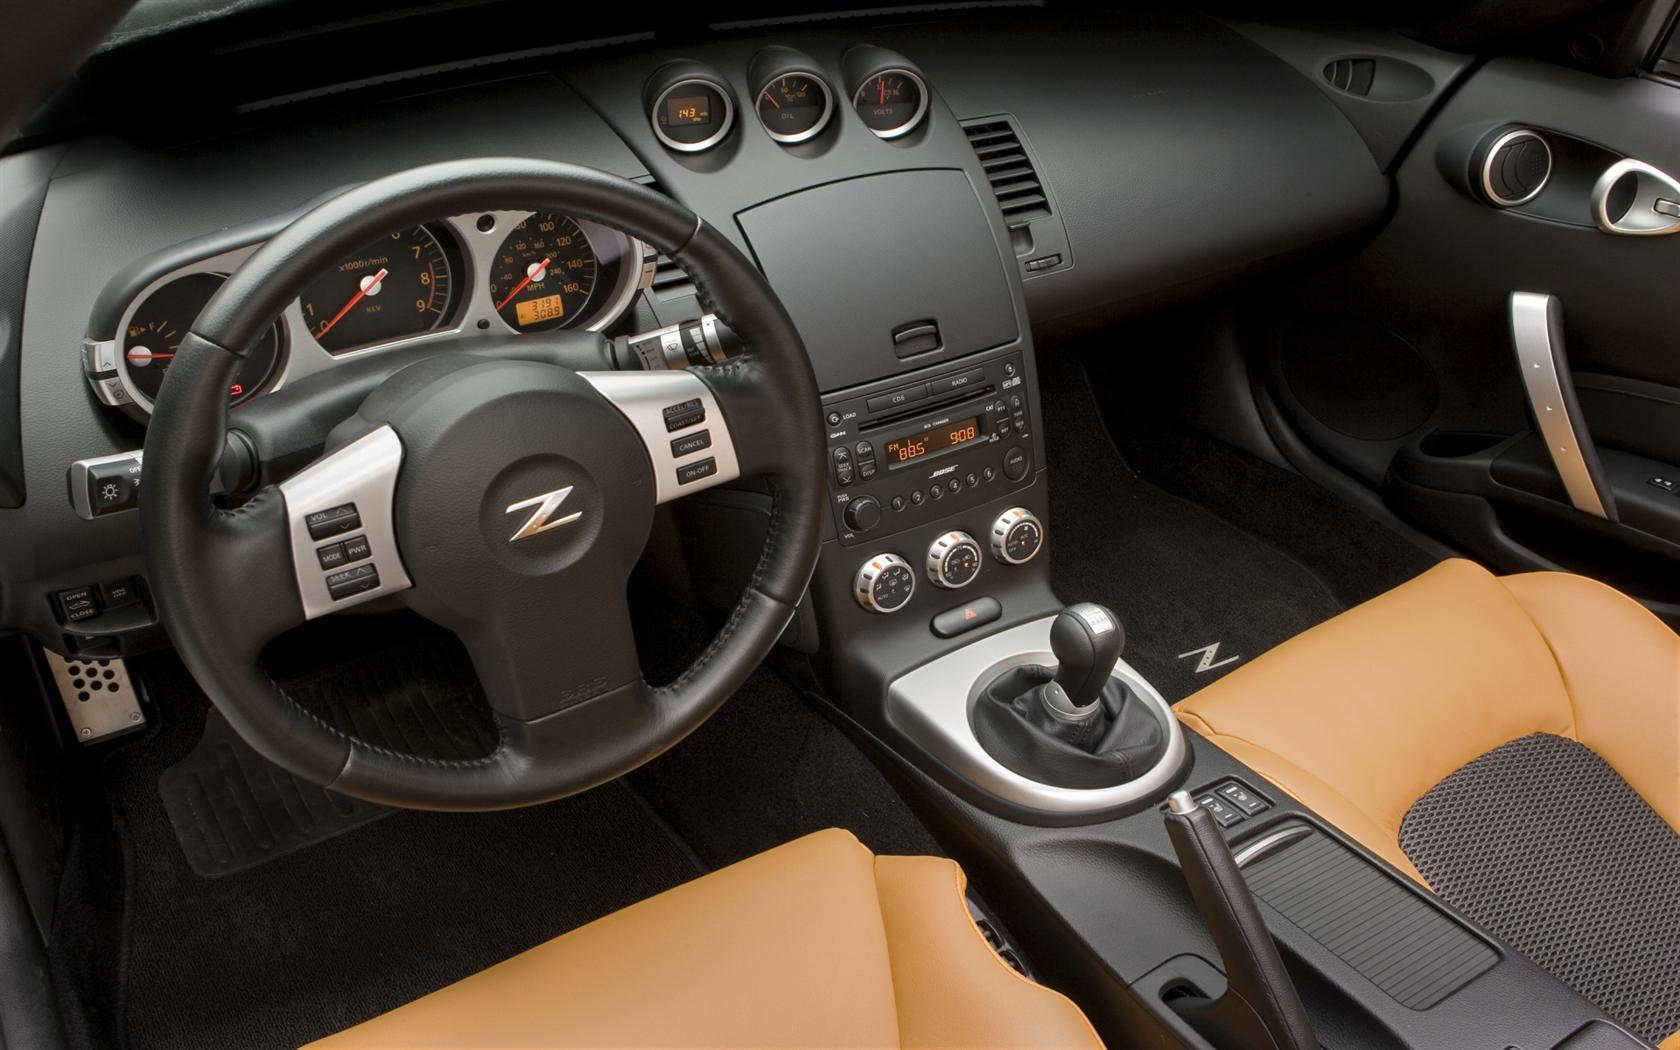 nissan 350z 2015 interior. nissan 350z photo 15 nissan 350z 2015 interior